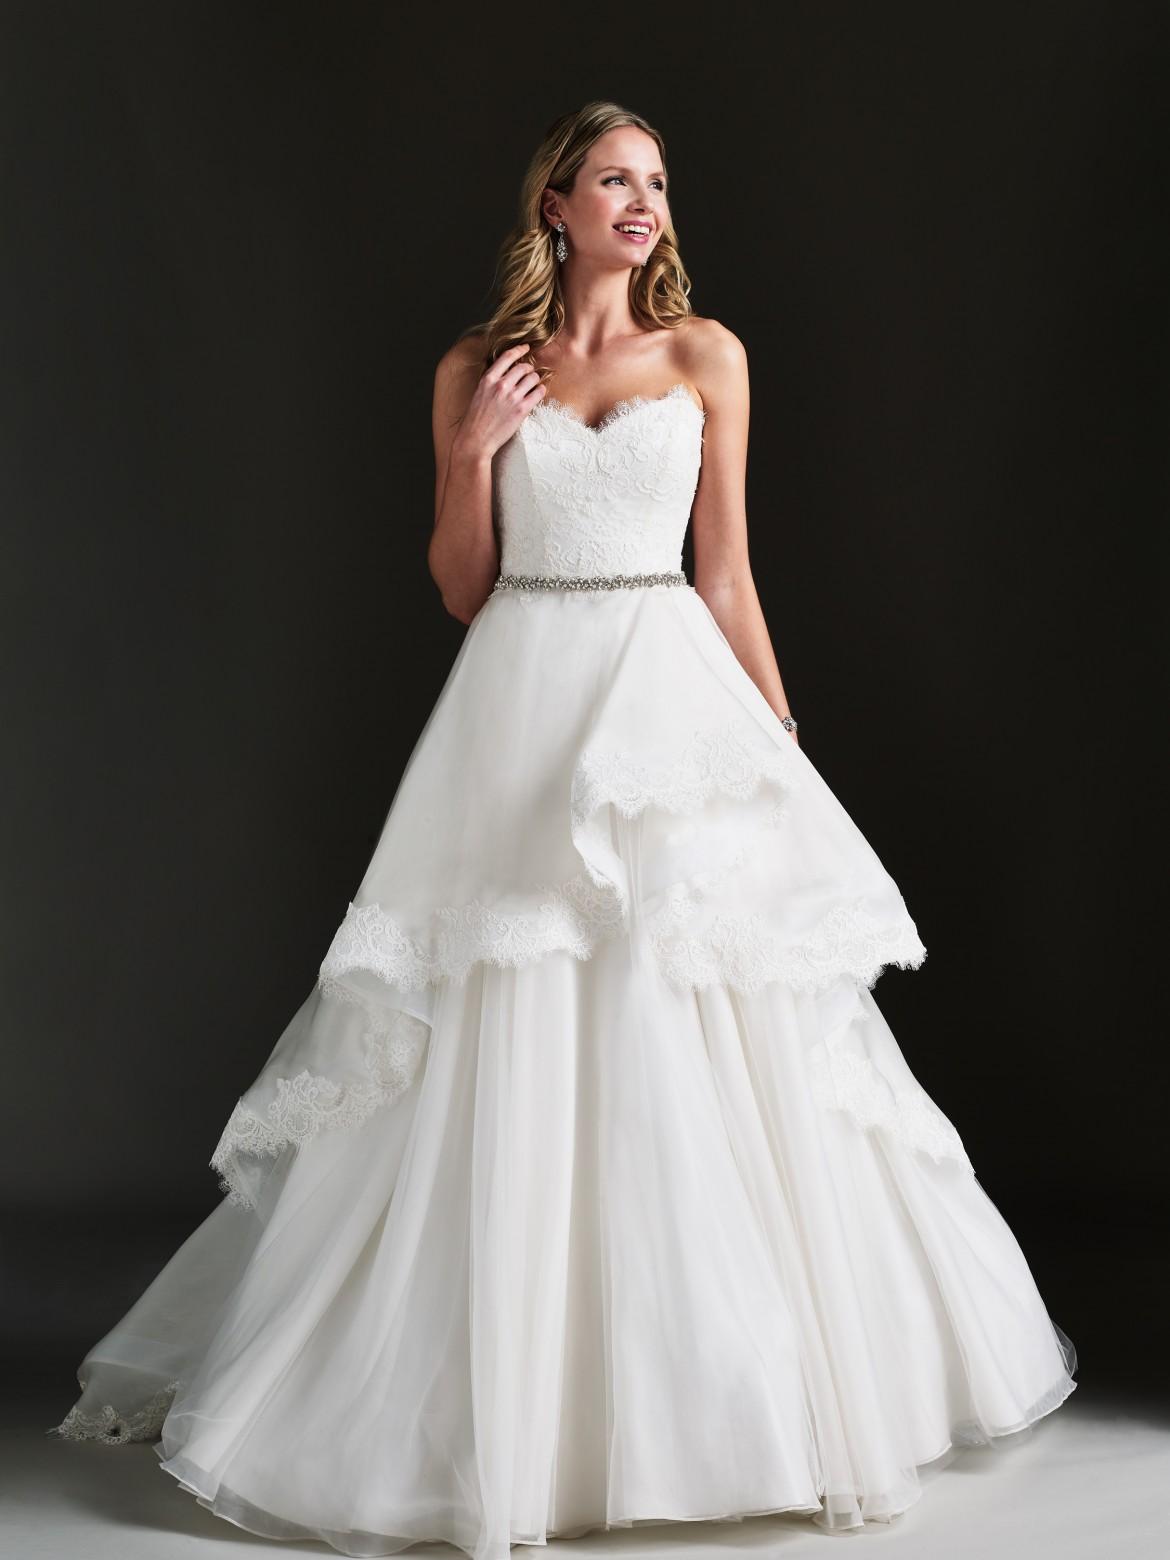 Taylor designer wedding dress by Caroline Castigliano